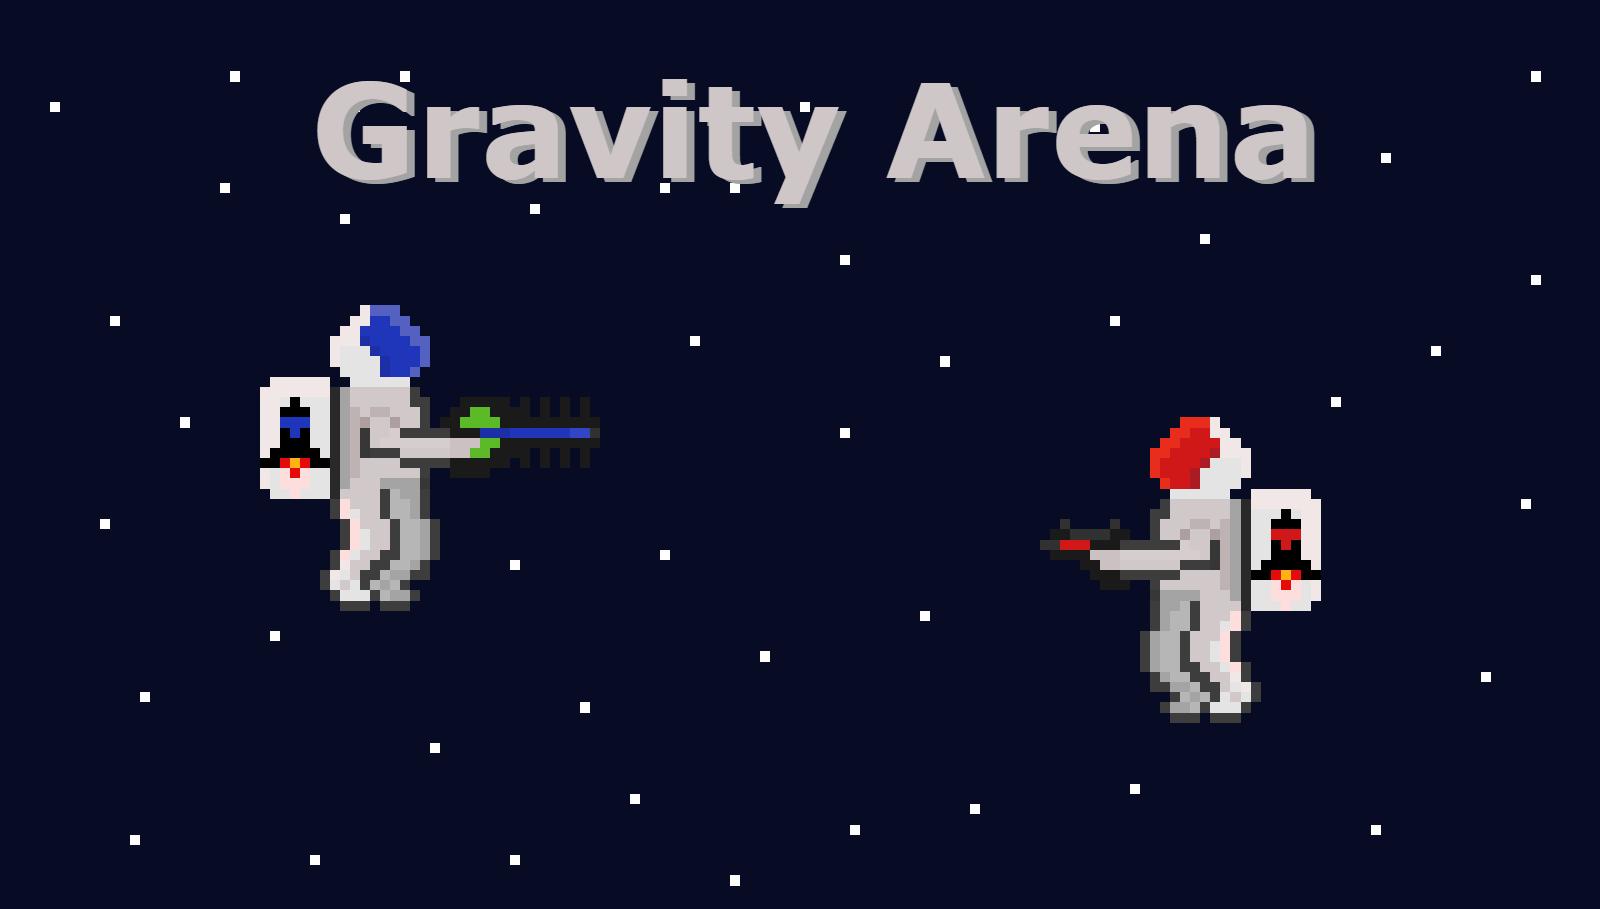 Gravity Arena